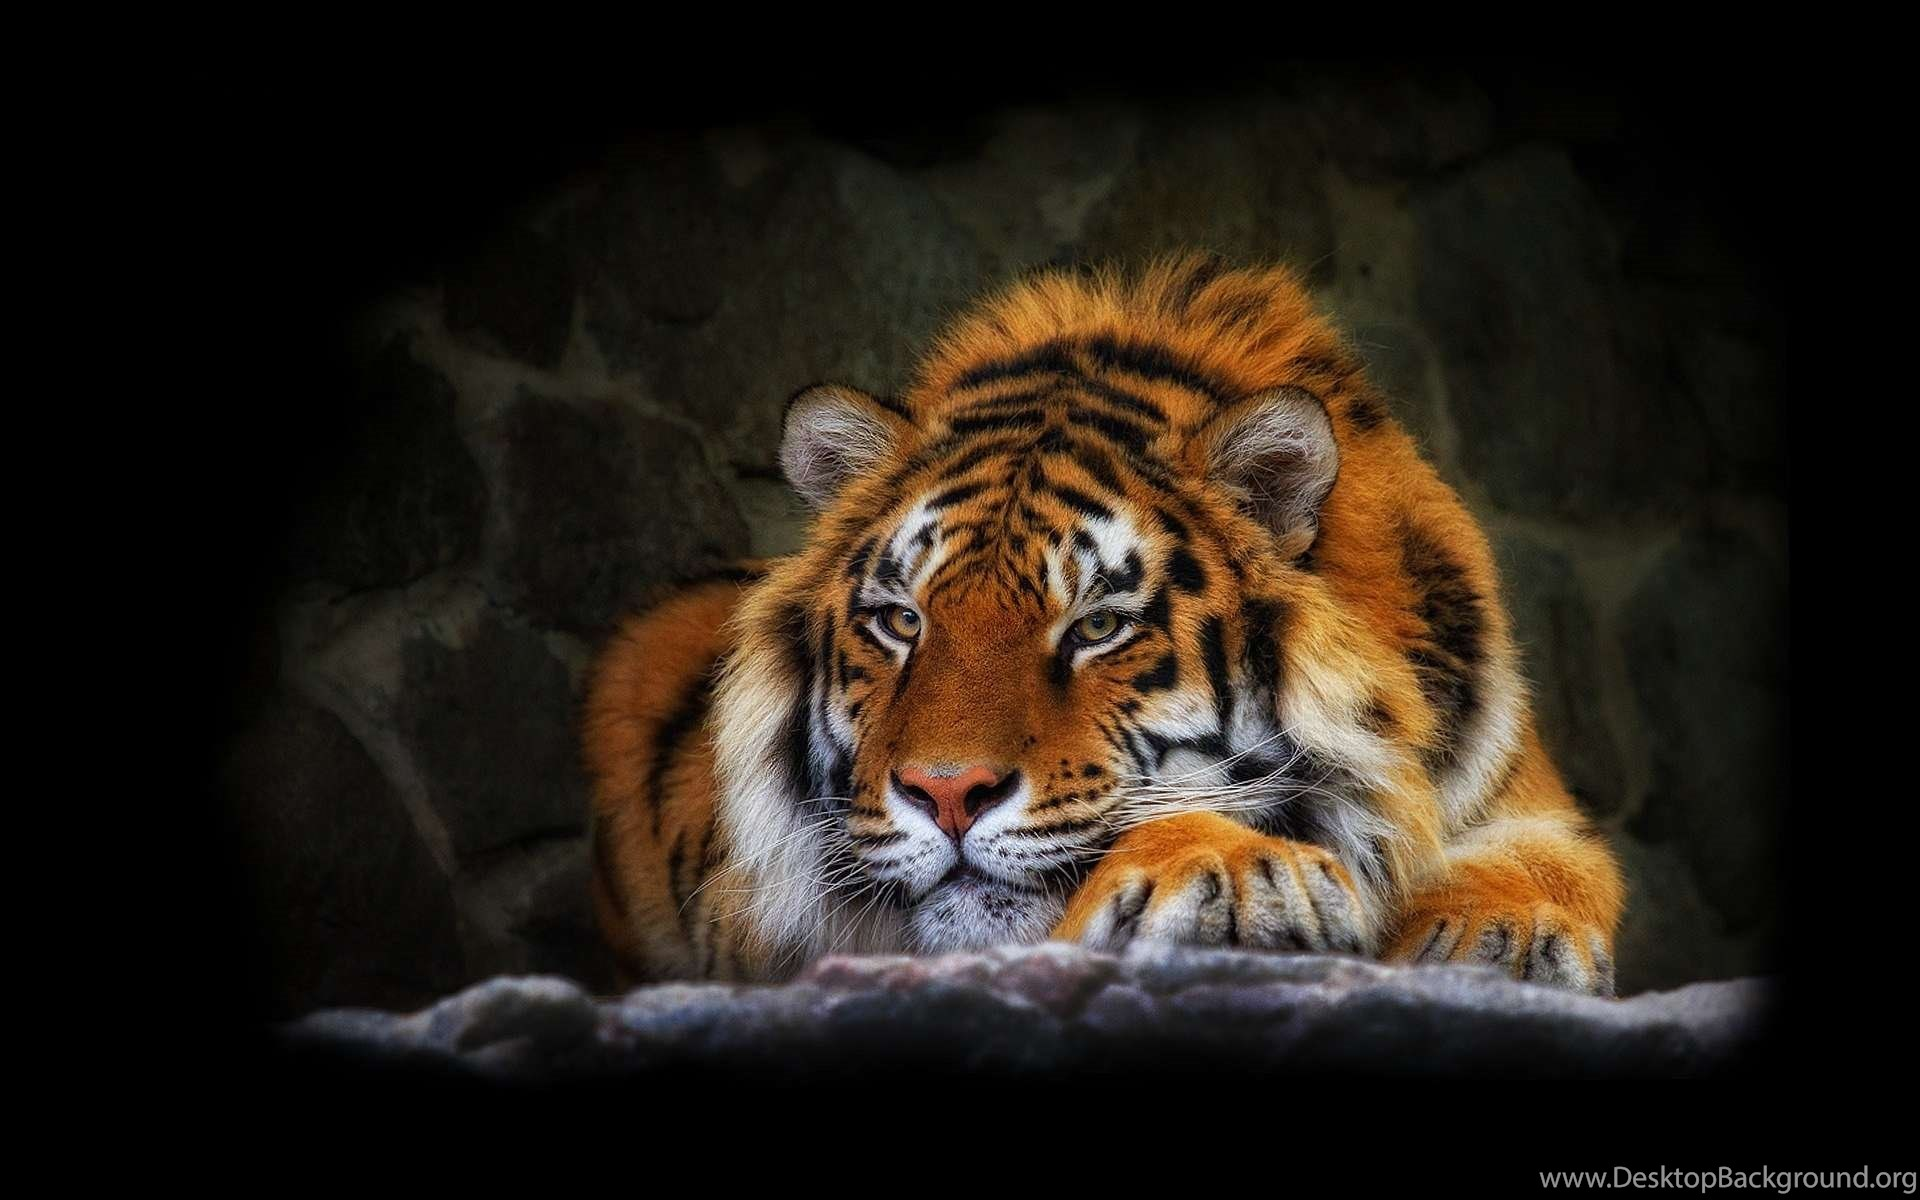 best tiger wallpapers ever hd wallpapers desktop background